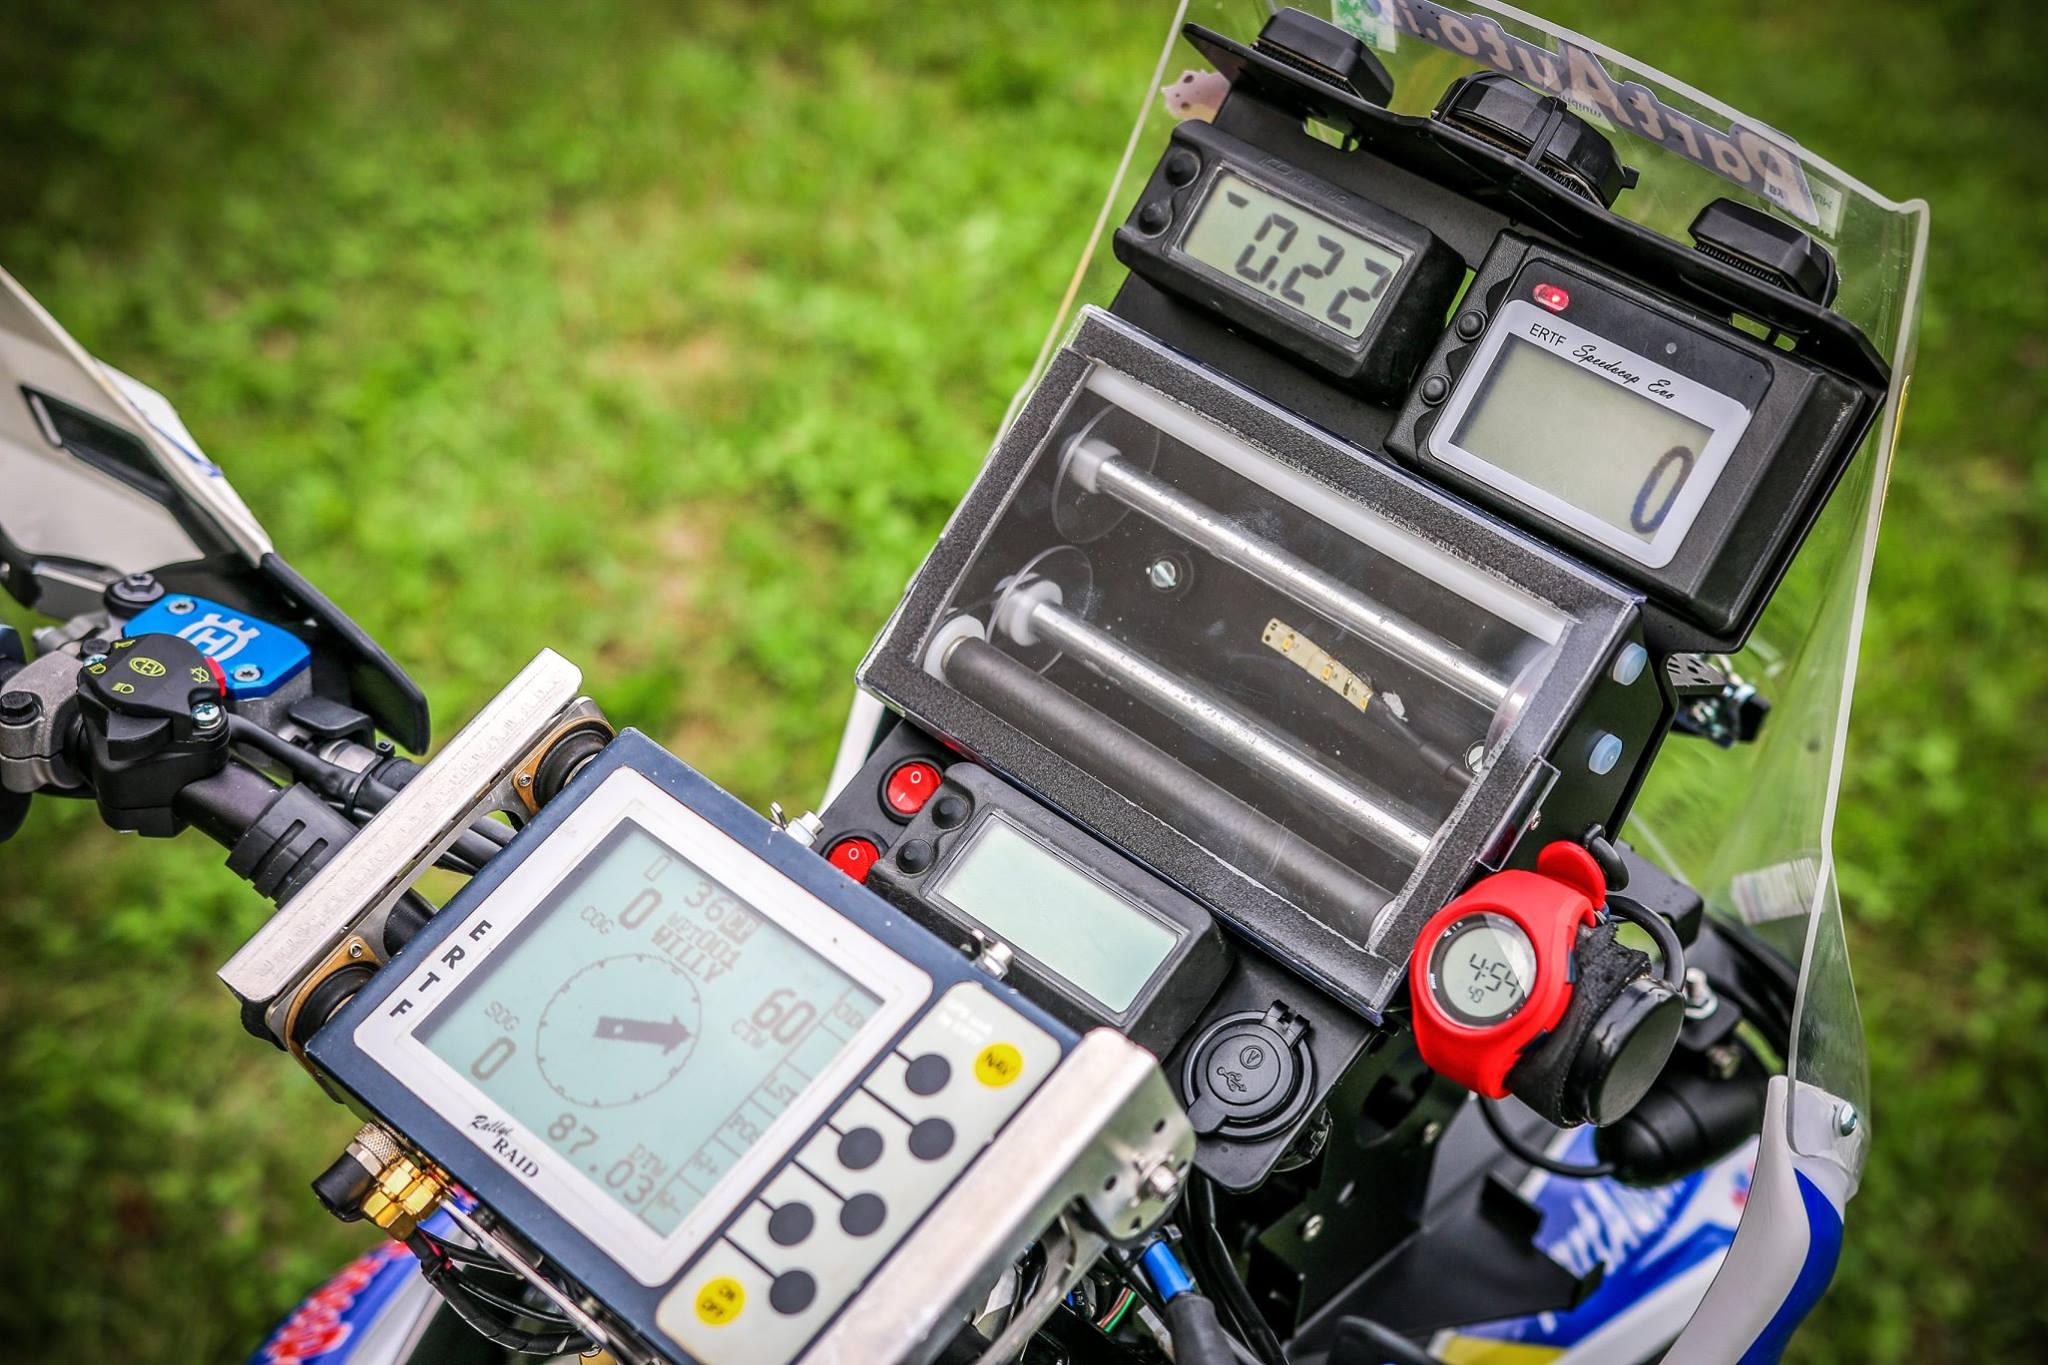 New Husqvarna Fe Rally Kit Rebel X Sports Srl Ktm Exc Fuse Box Roadbook Holder Bracket Versatile Tripmaster Speedocaps Brackets 3 Gps Antennas Smalltrack Iritrack